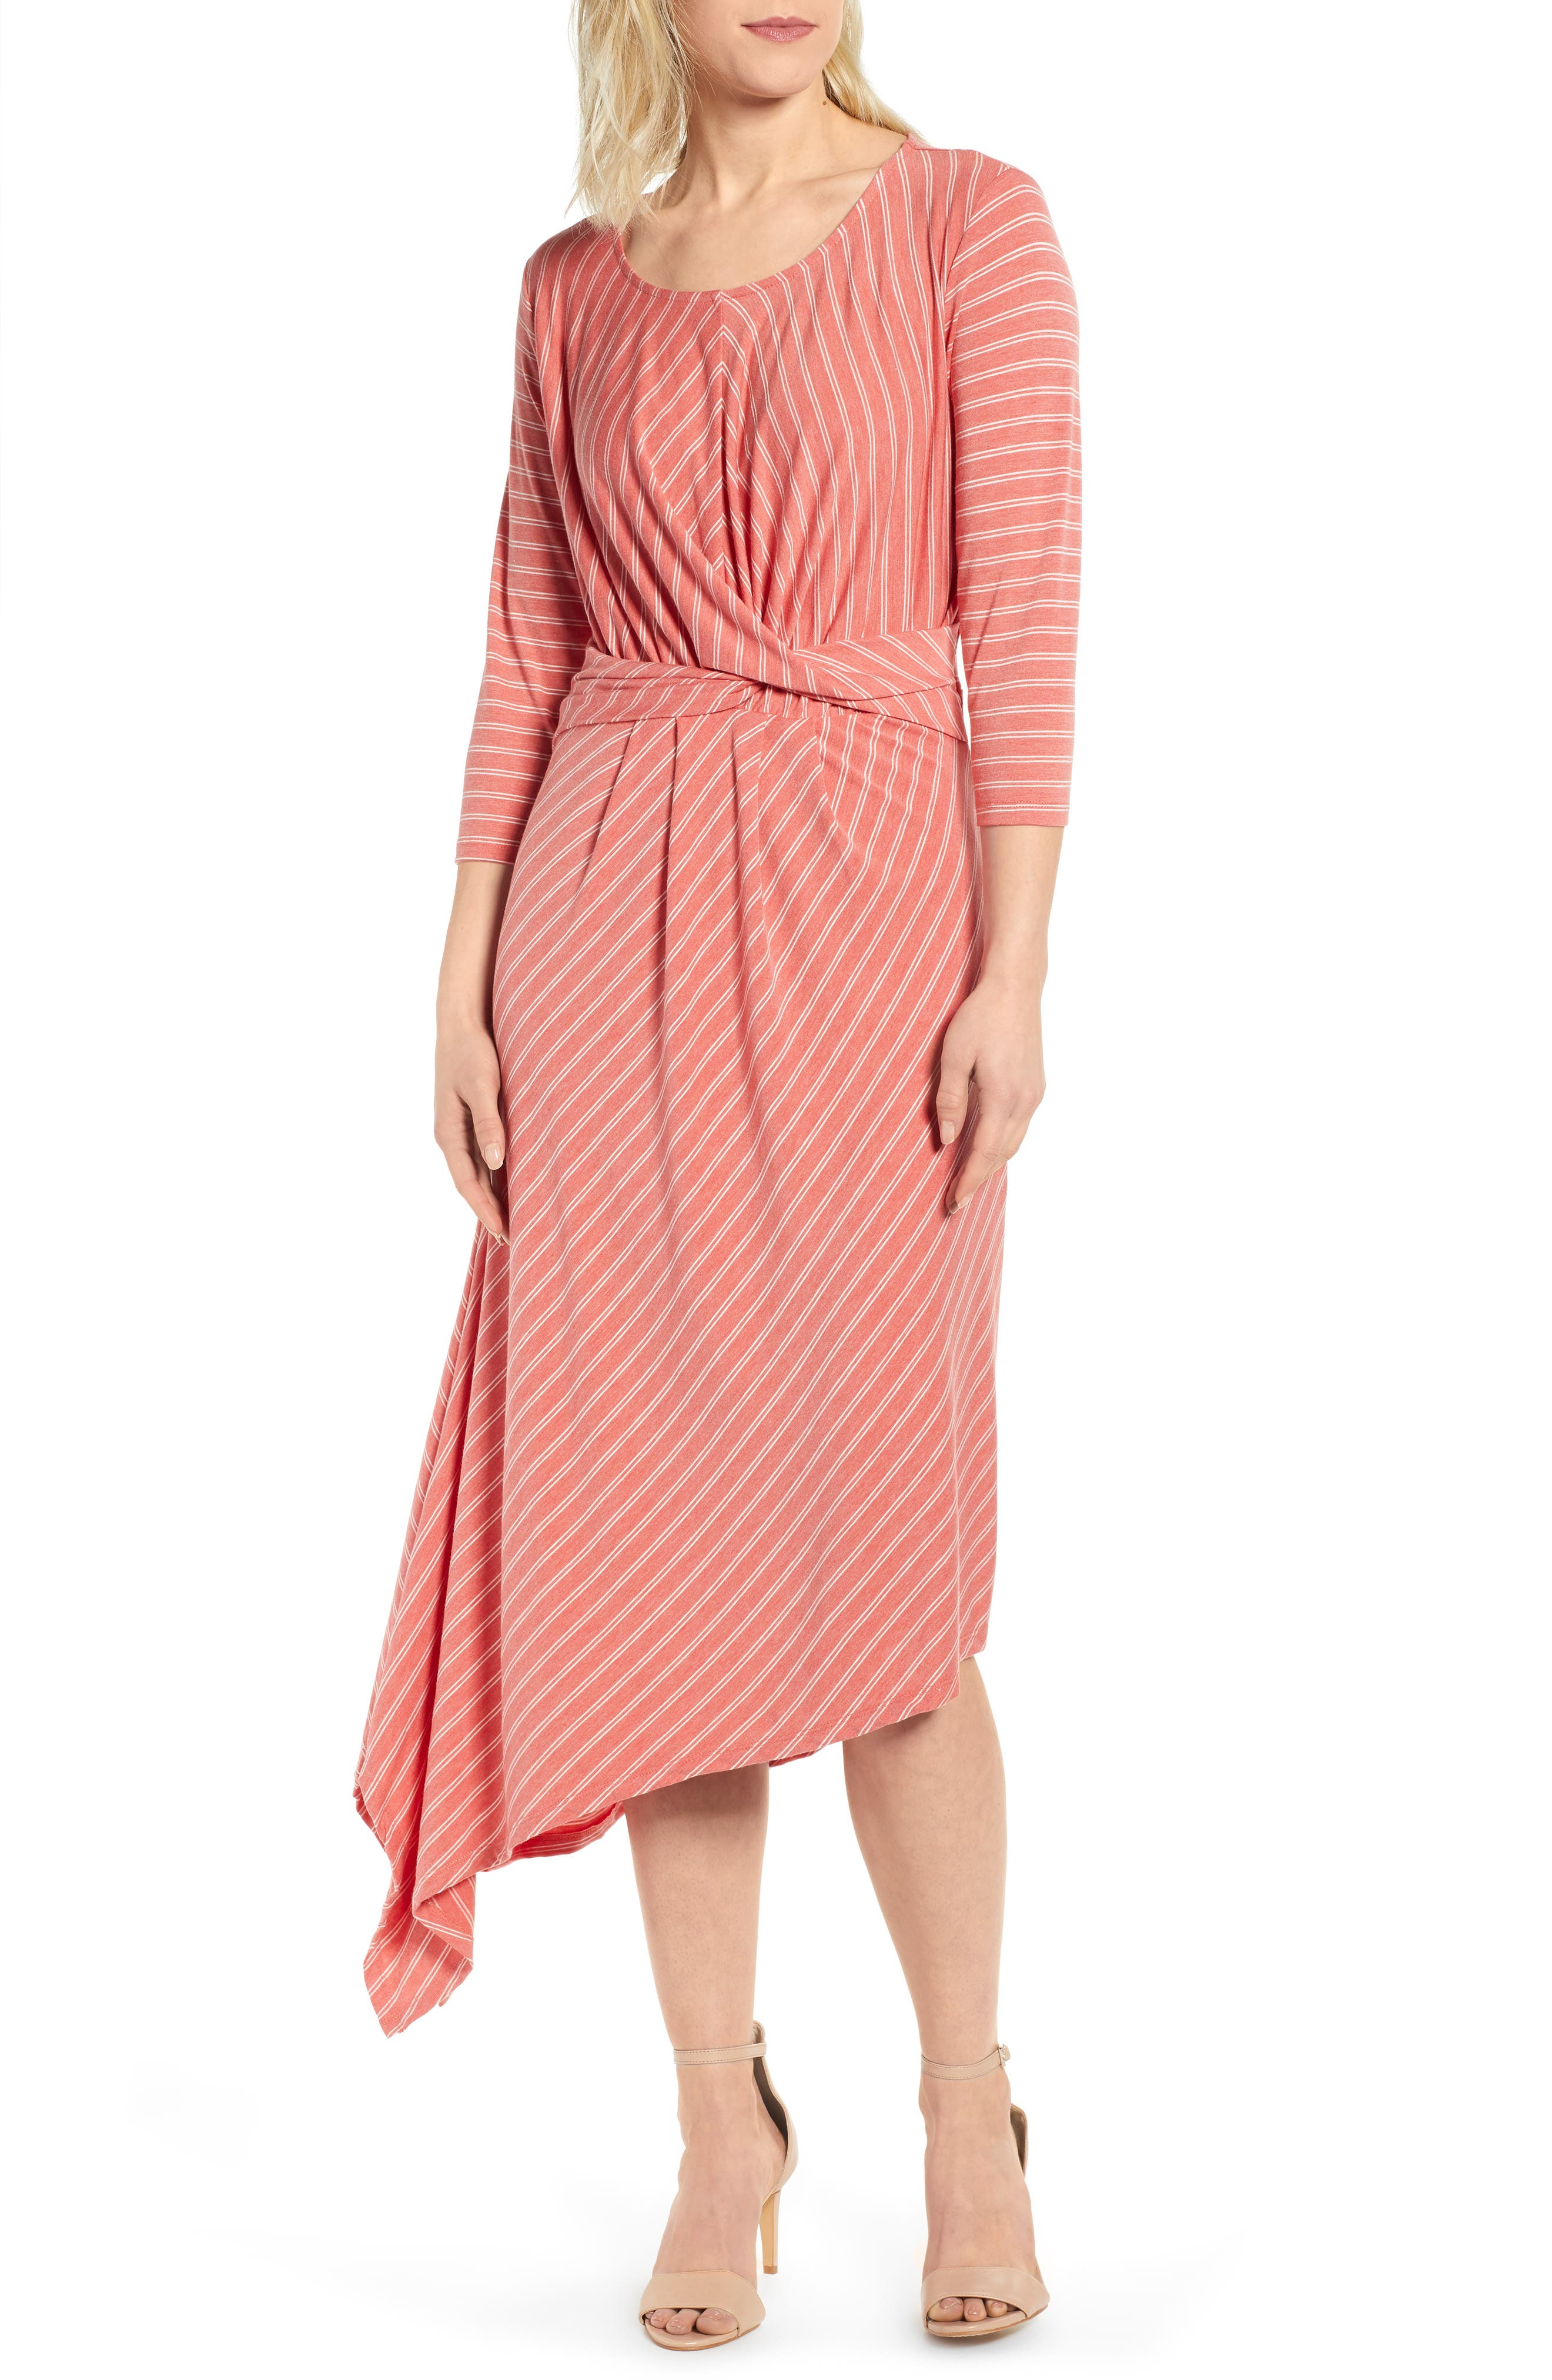 Bobeau Clara Twist Front Asymmetrical Dress, Orange